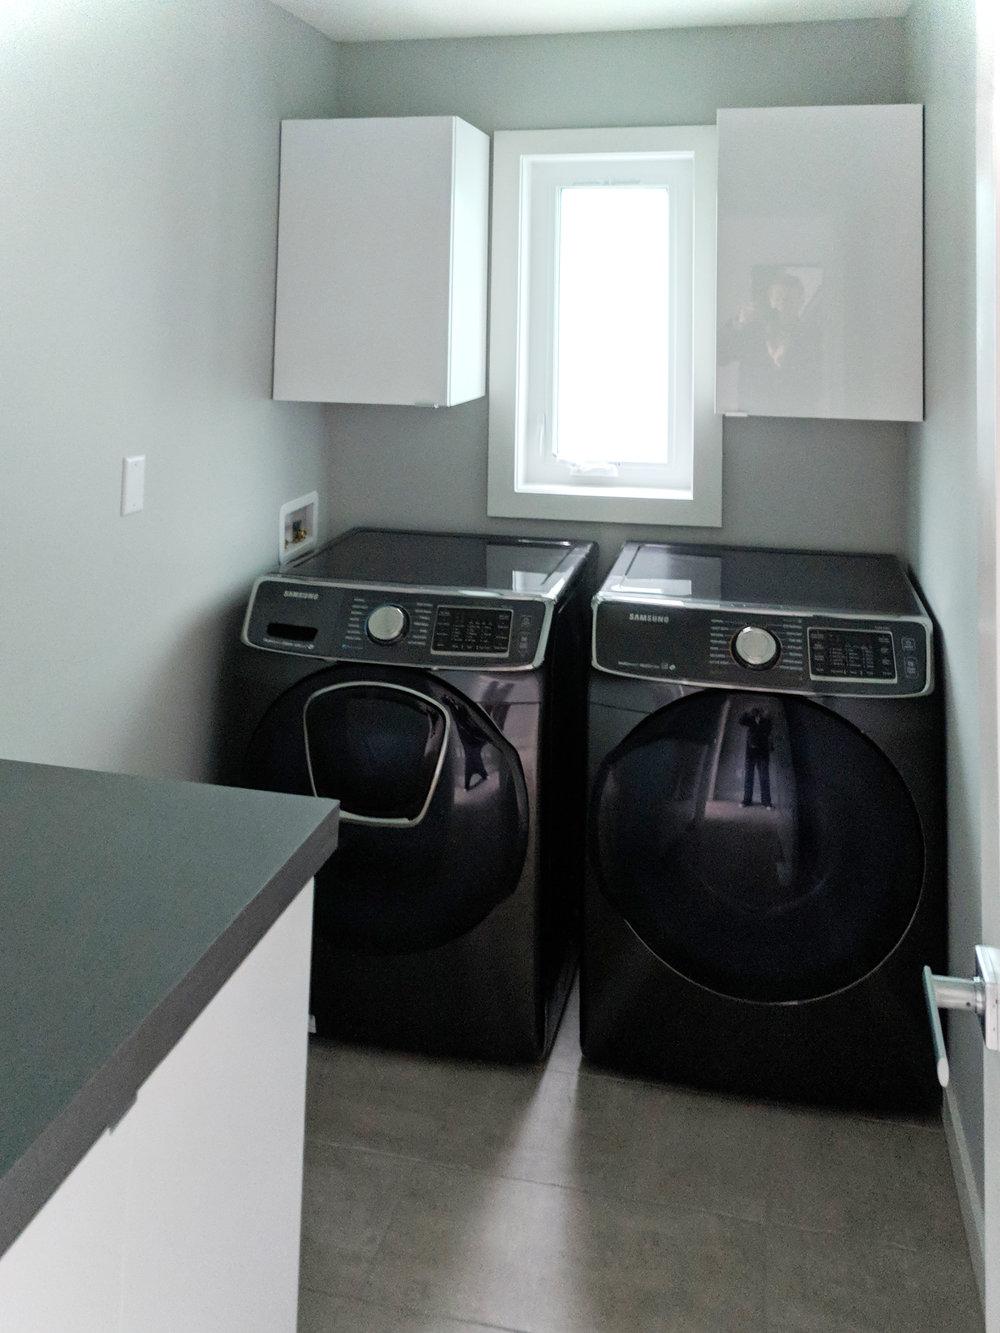 Laundry area - IMG_20190122_123001.jpg